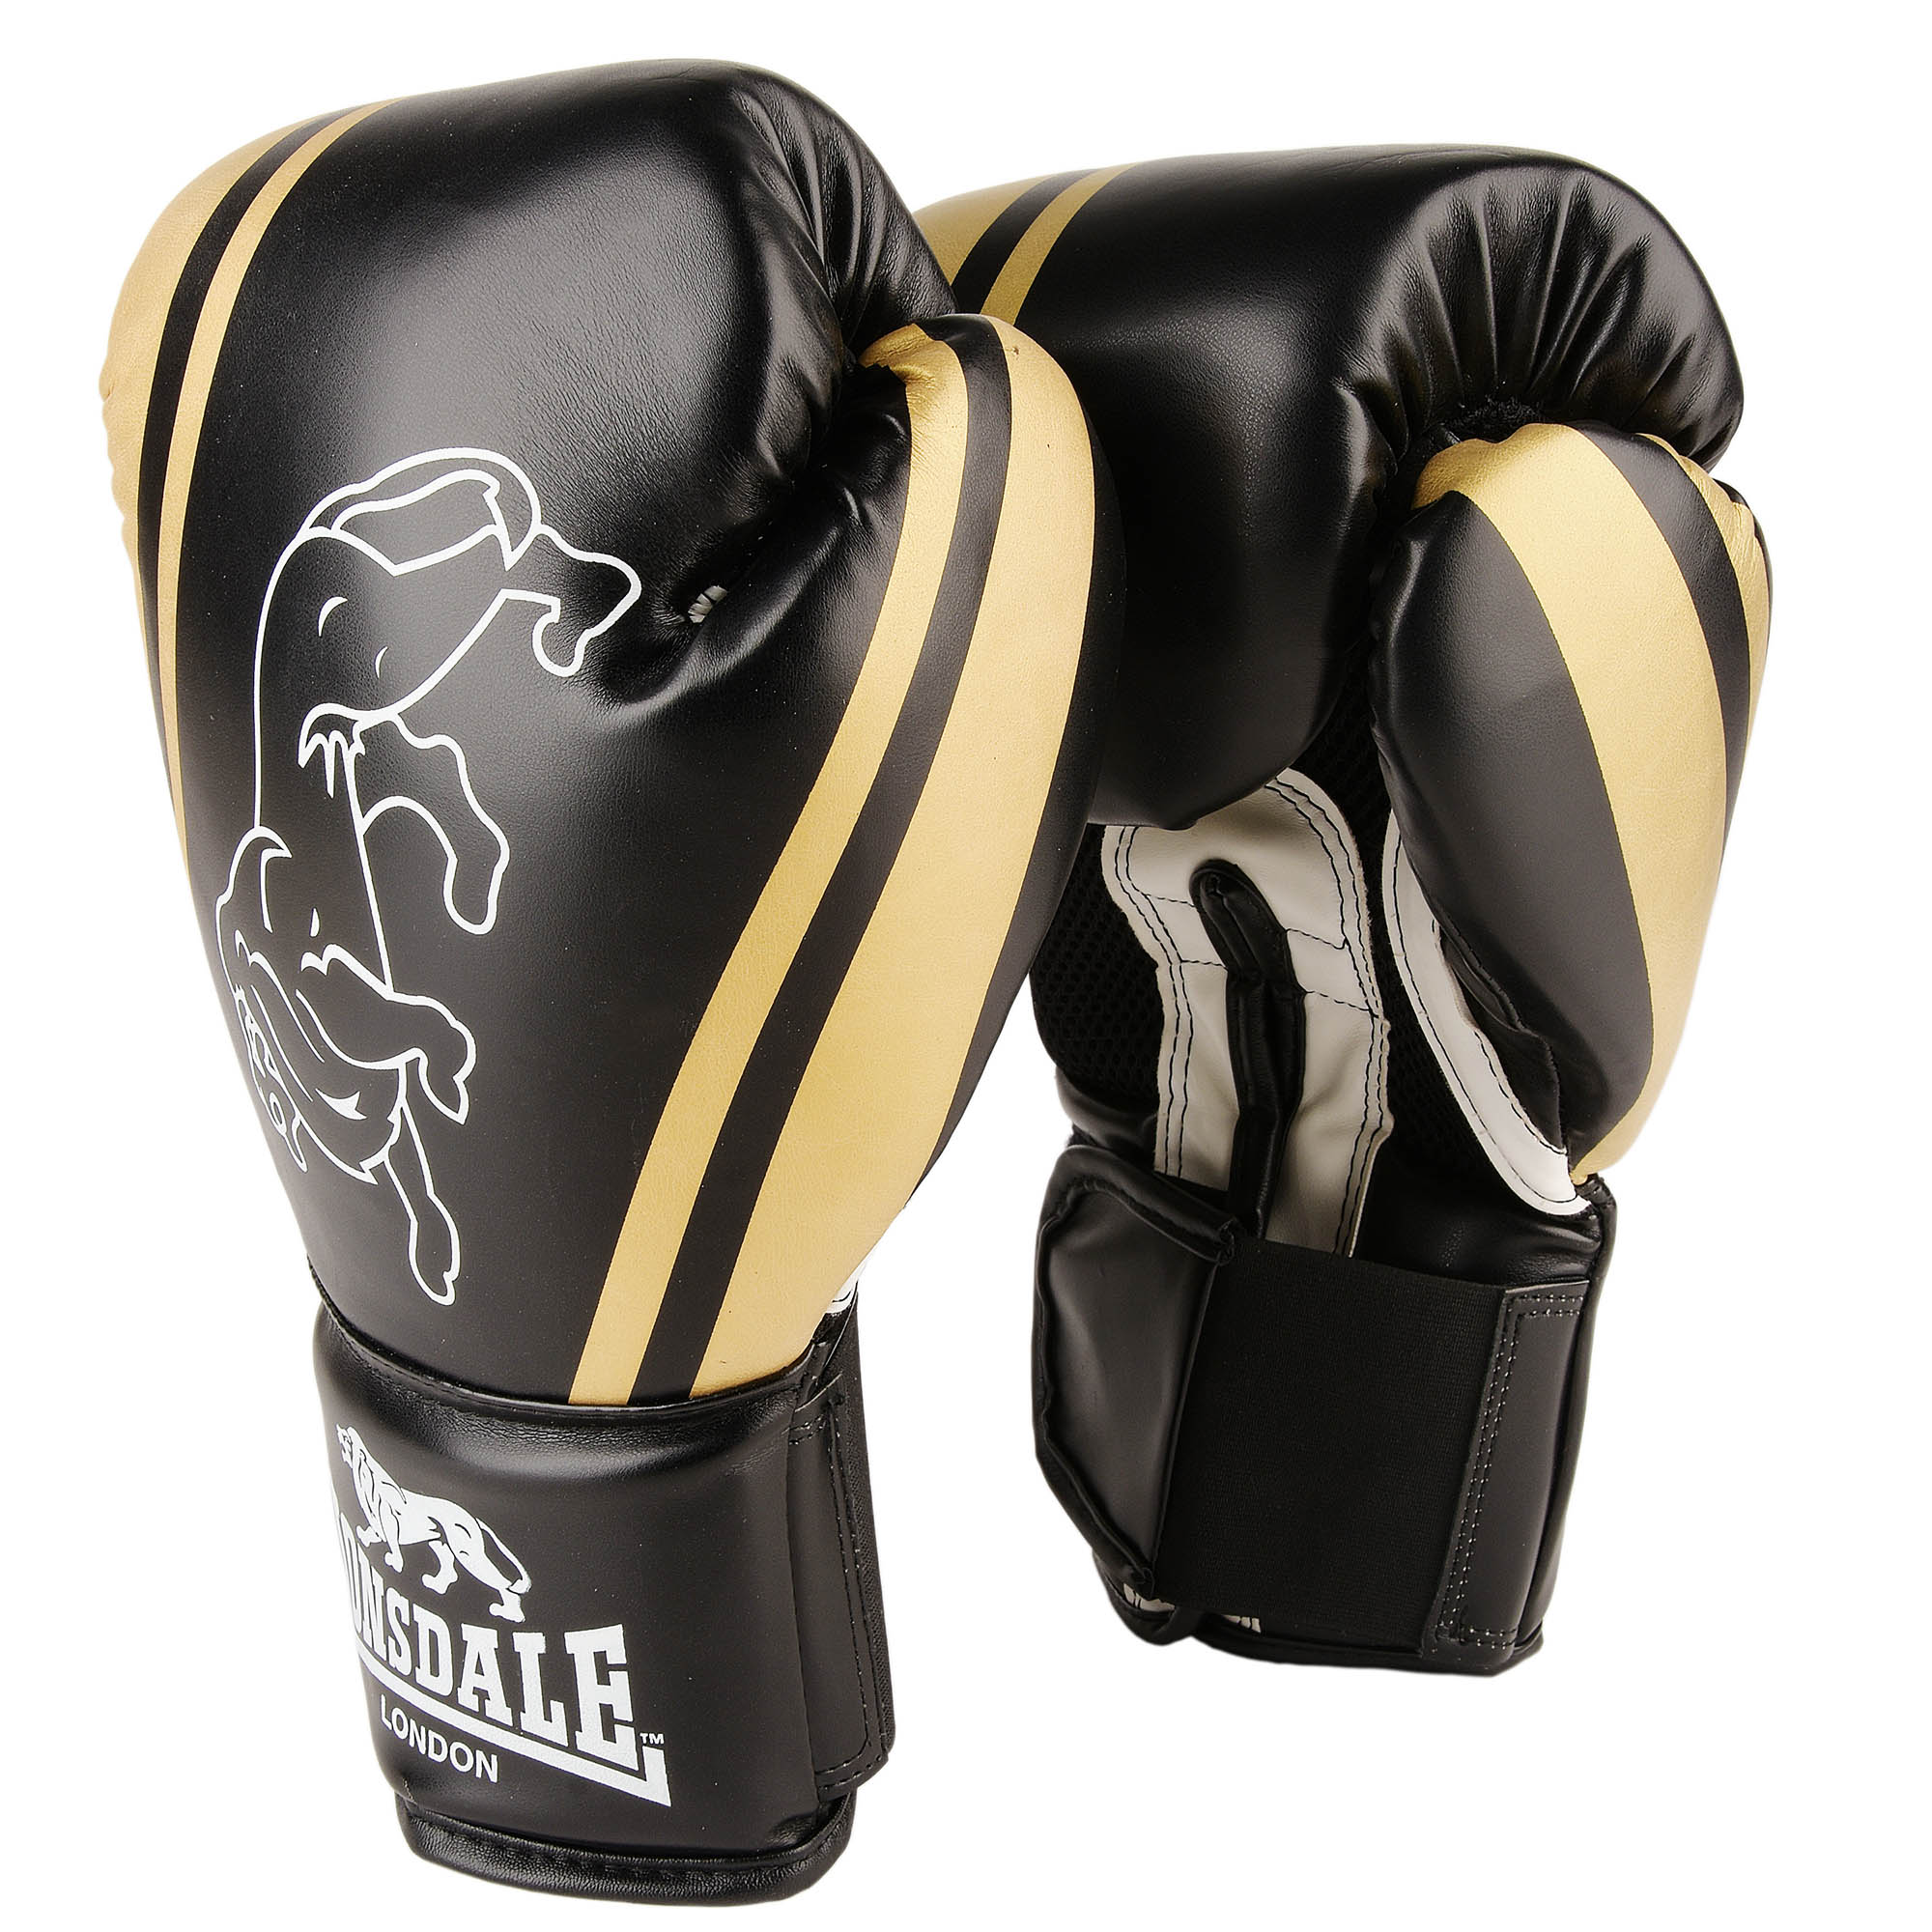 Lonsdale Club Training Gloves - Black/Gold, 10oz